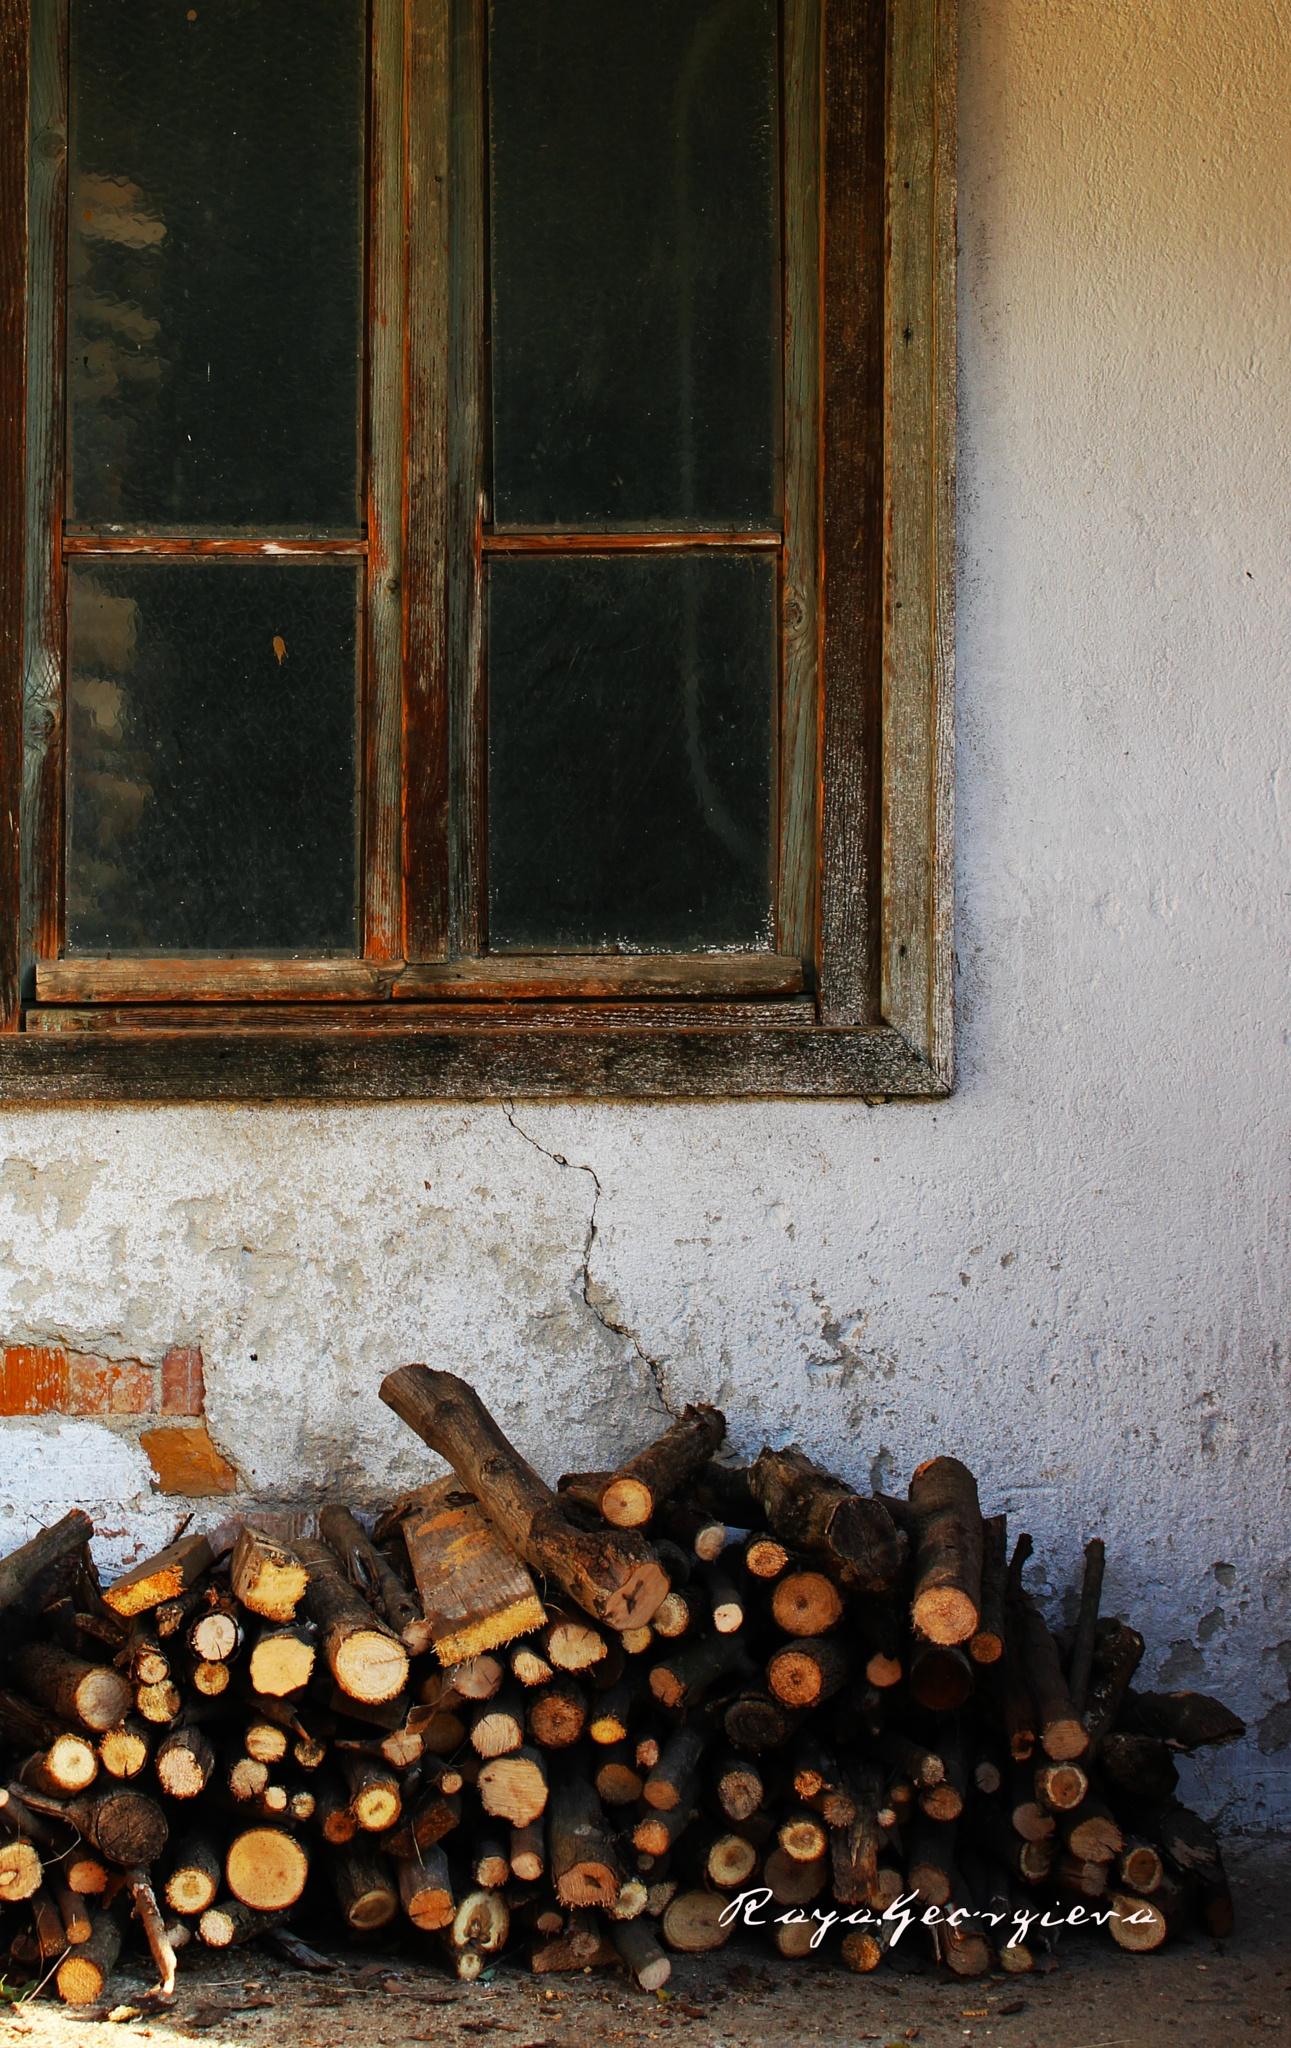 window by Raya GeoRgieva